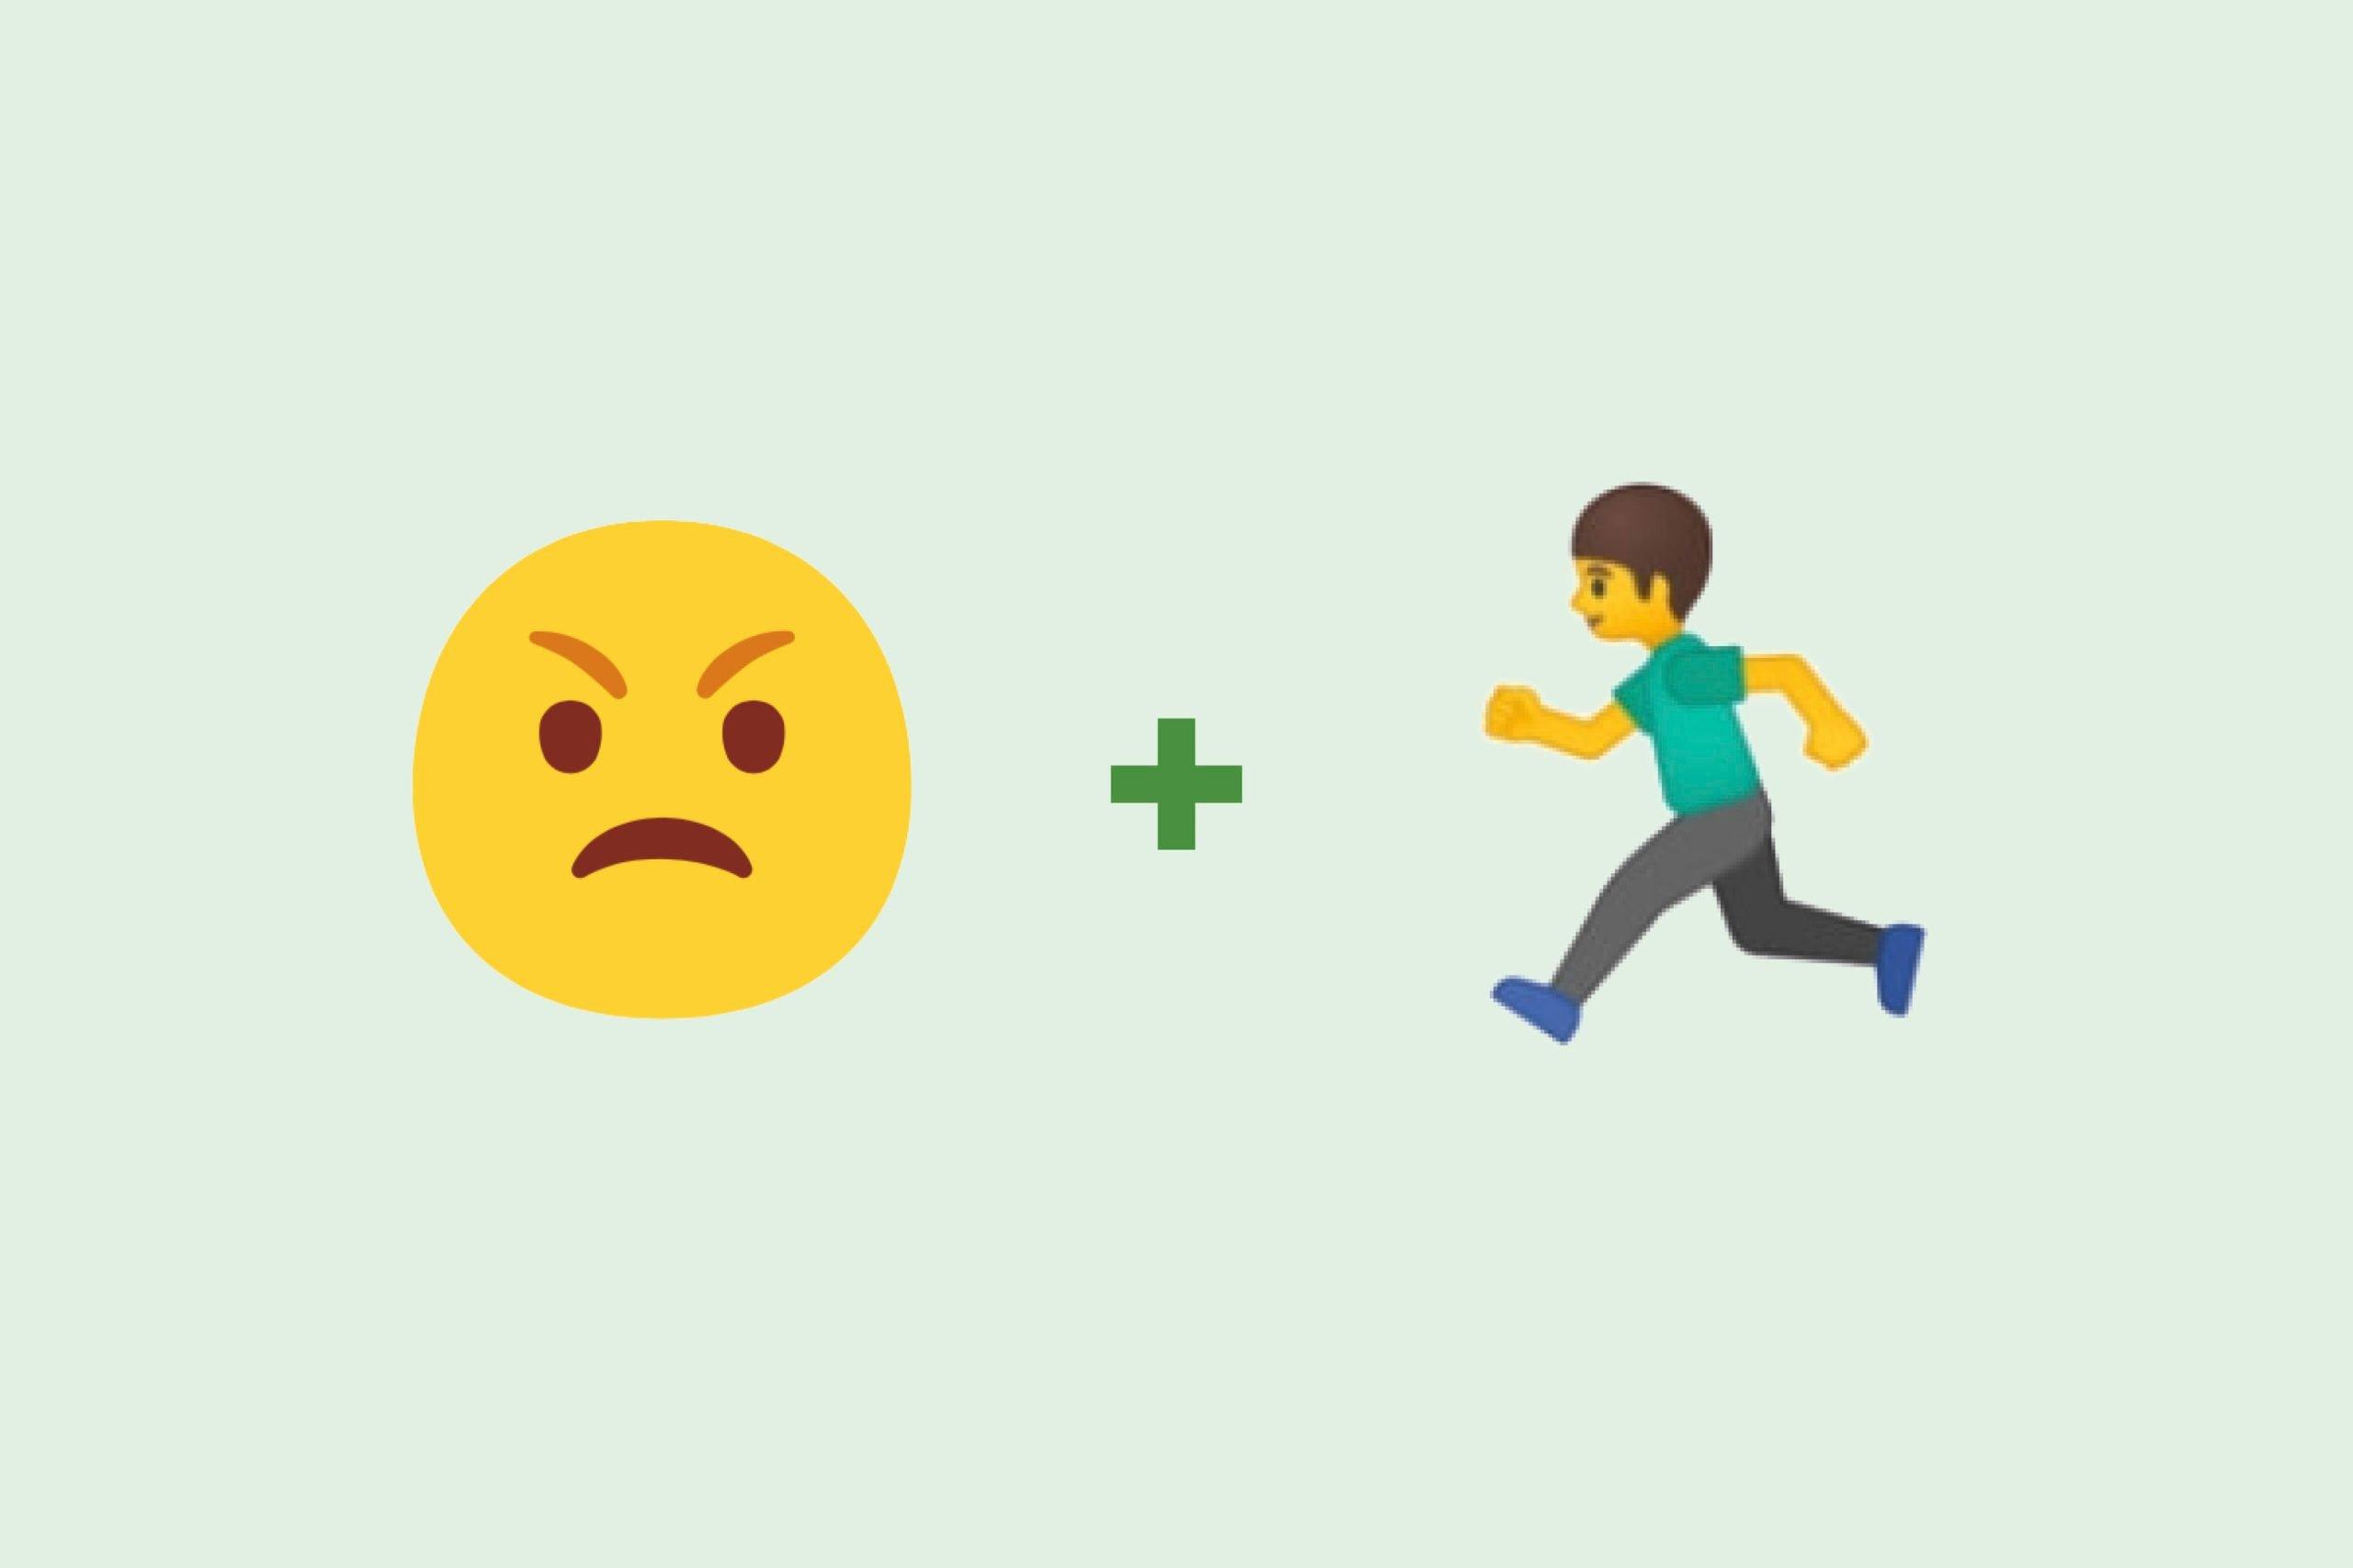 Angry emoji + man emoji